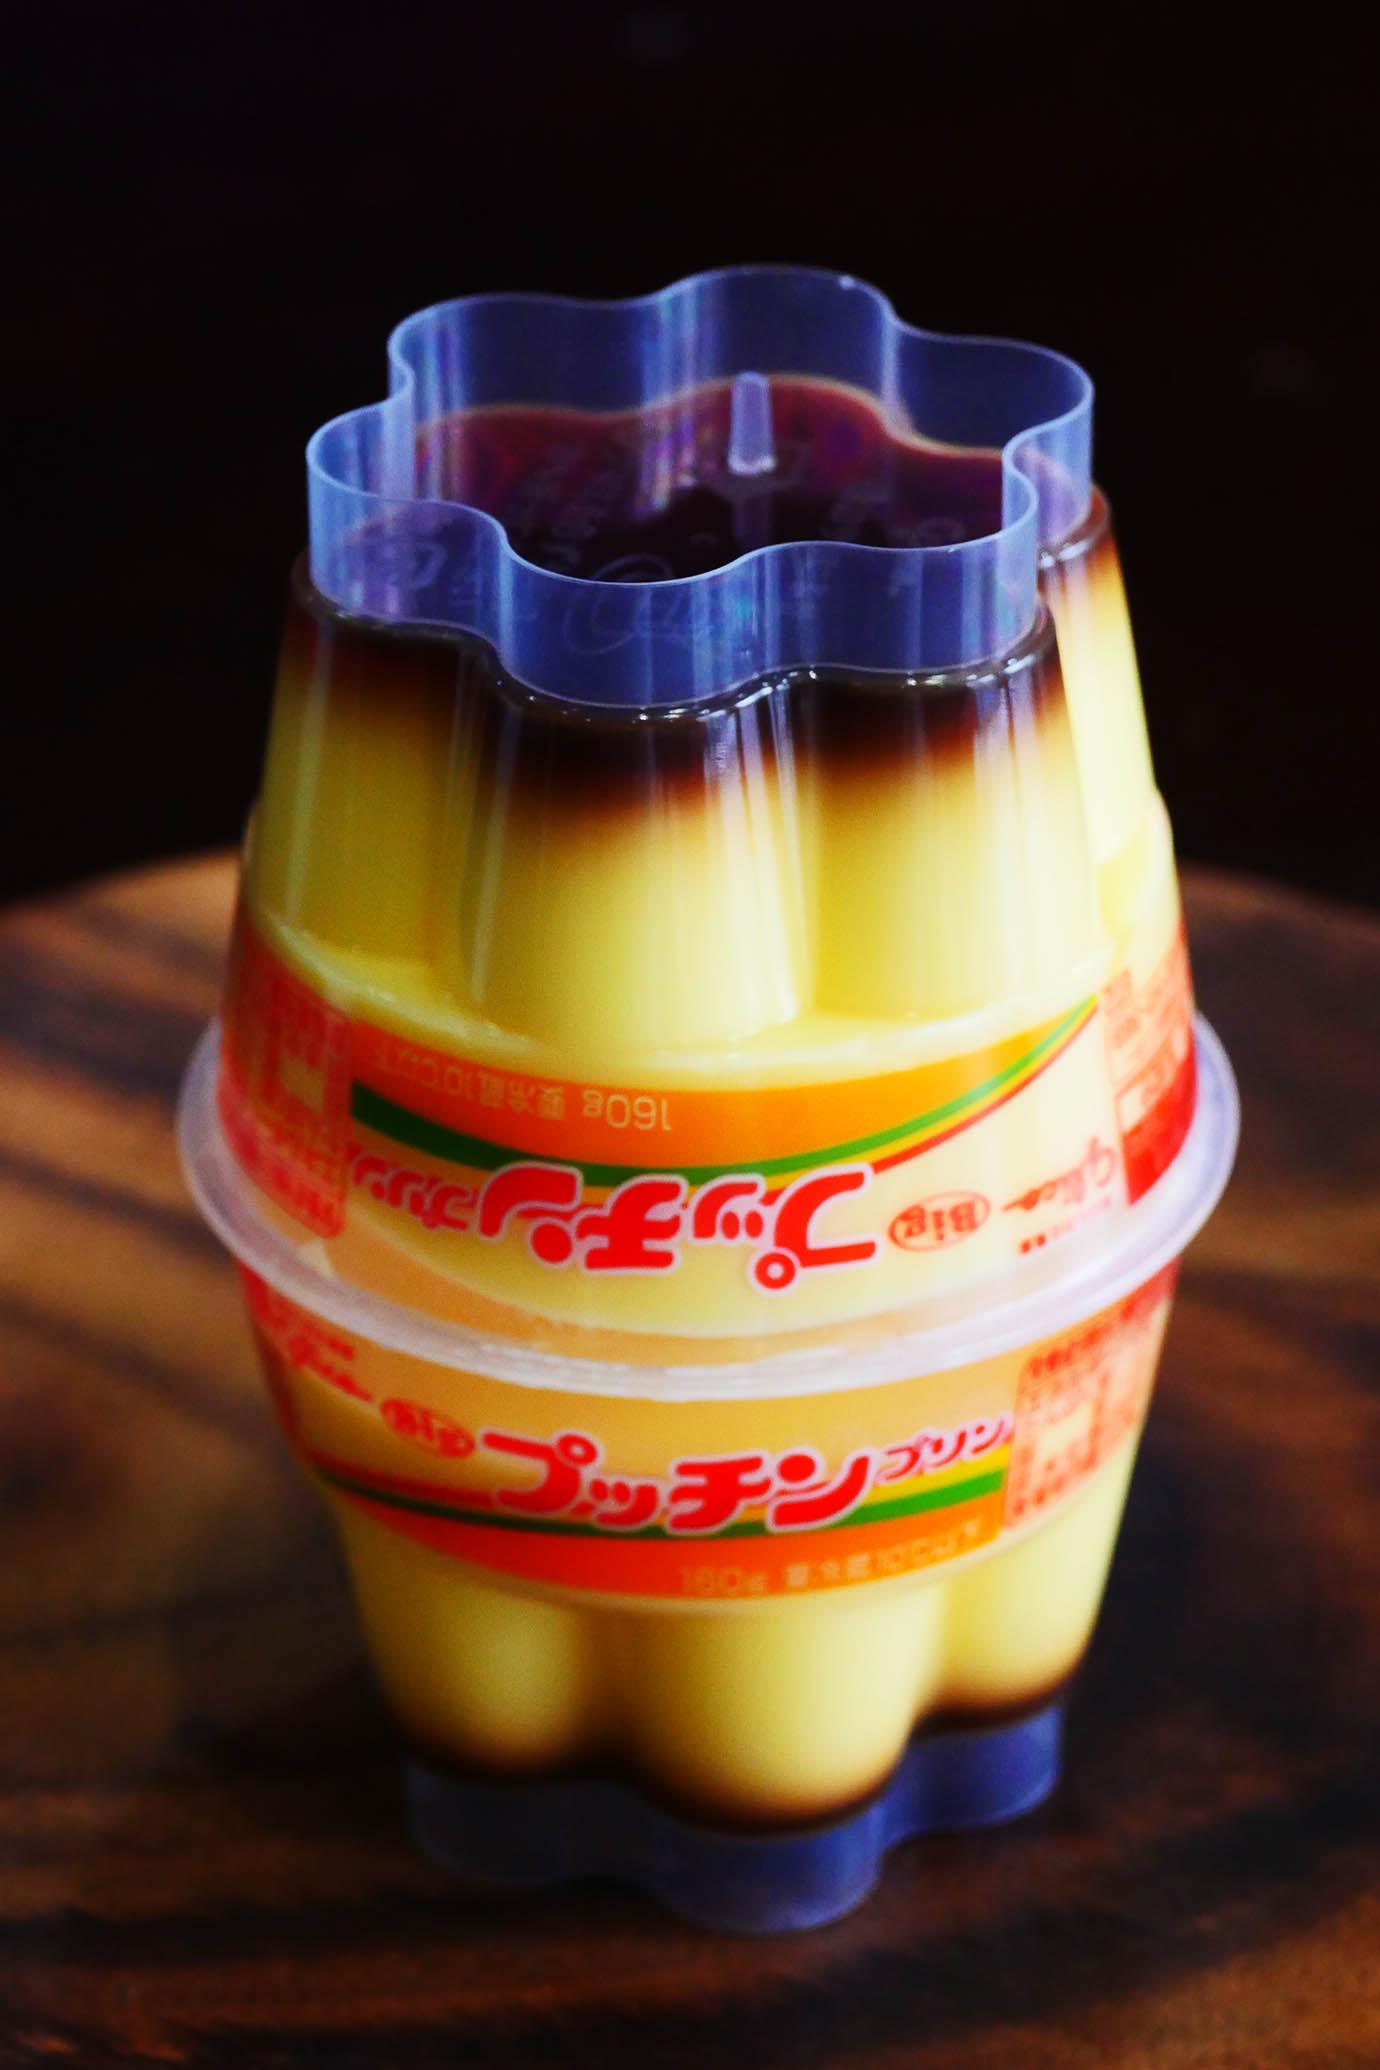 pucchin-pudding-dekamori1